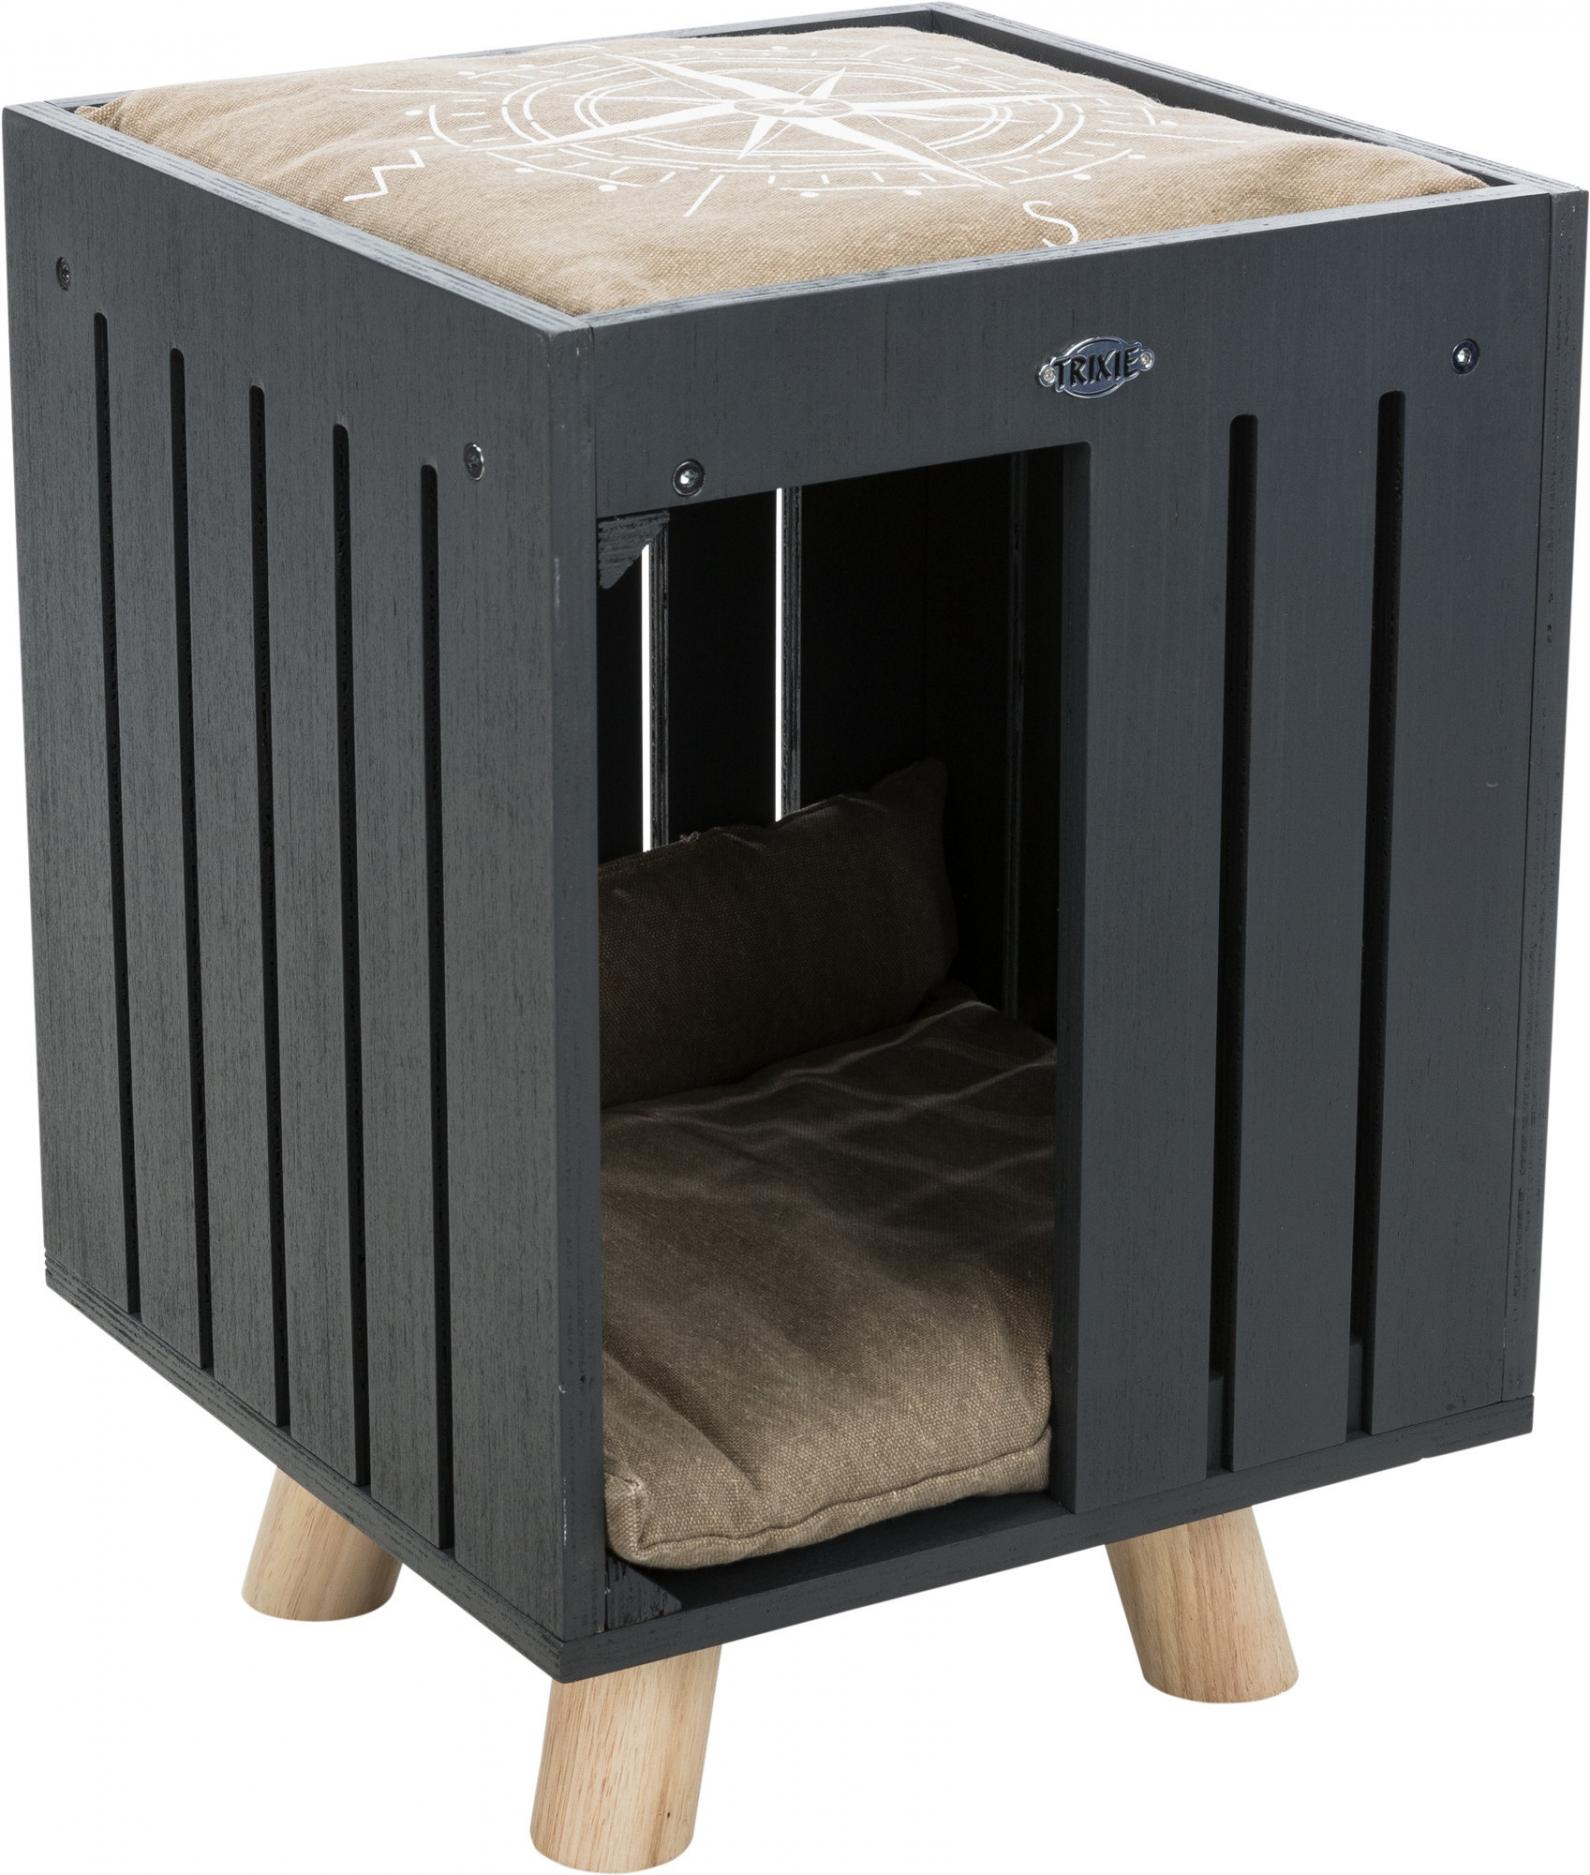 BE NORDIC relax-iglo Alva, 36 × 51 × 36 cm, antraciet/zand